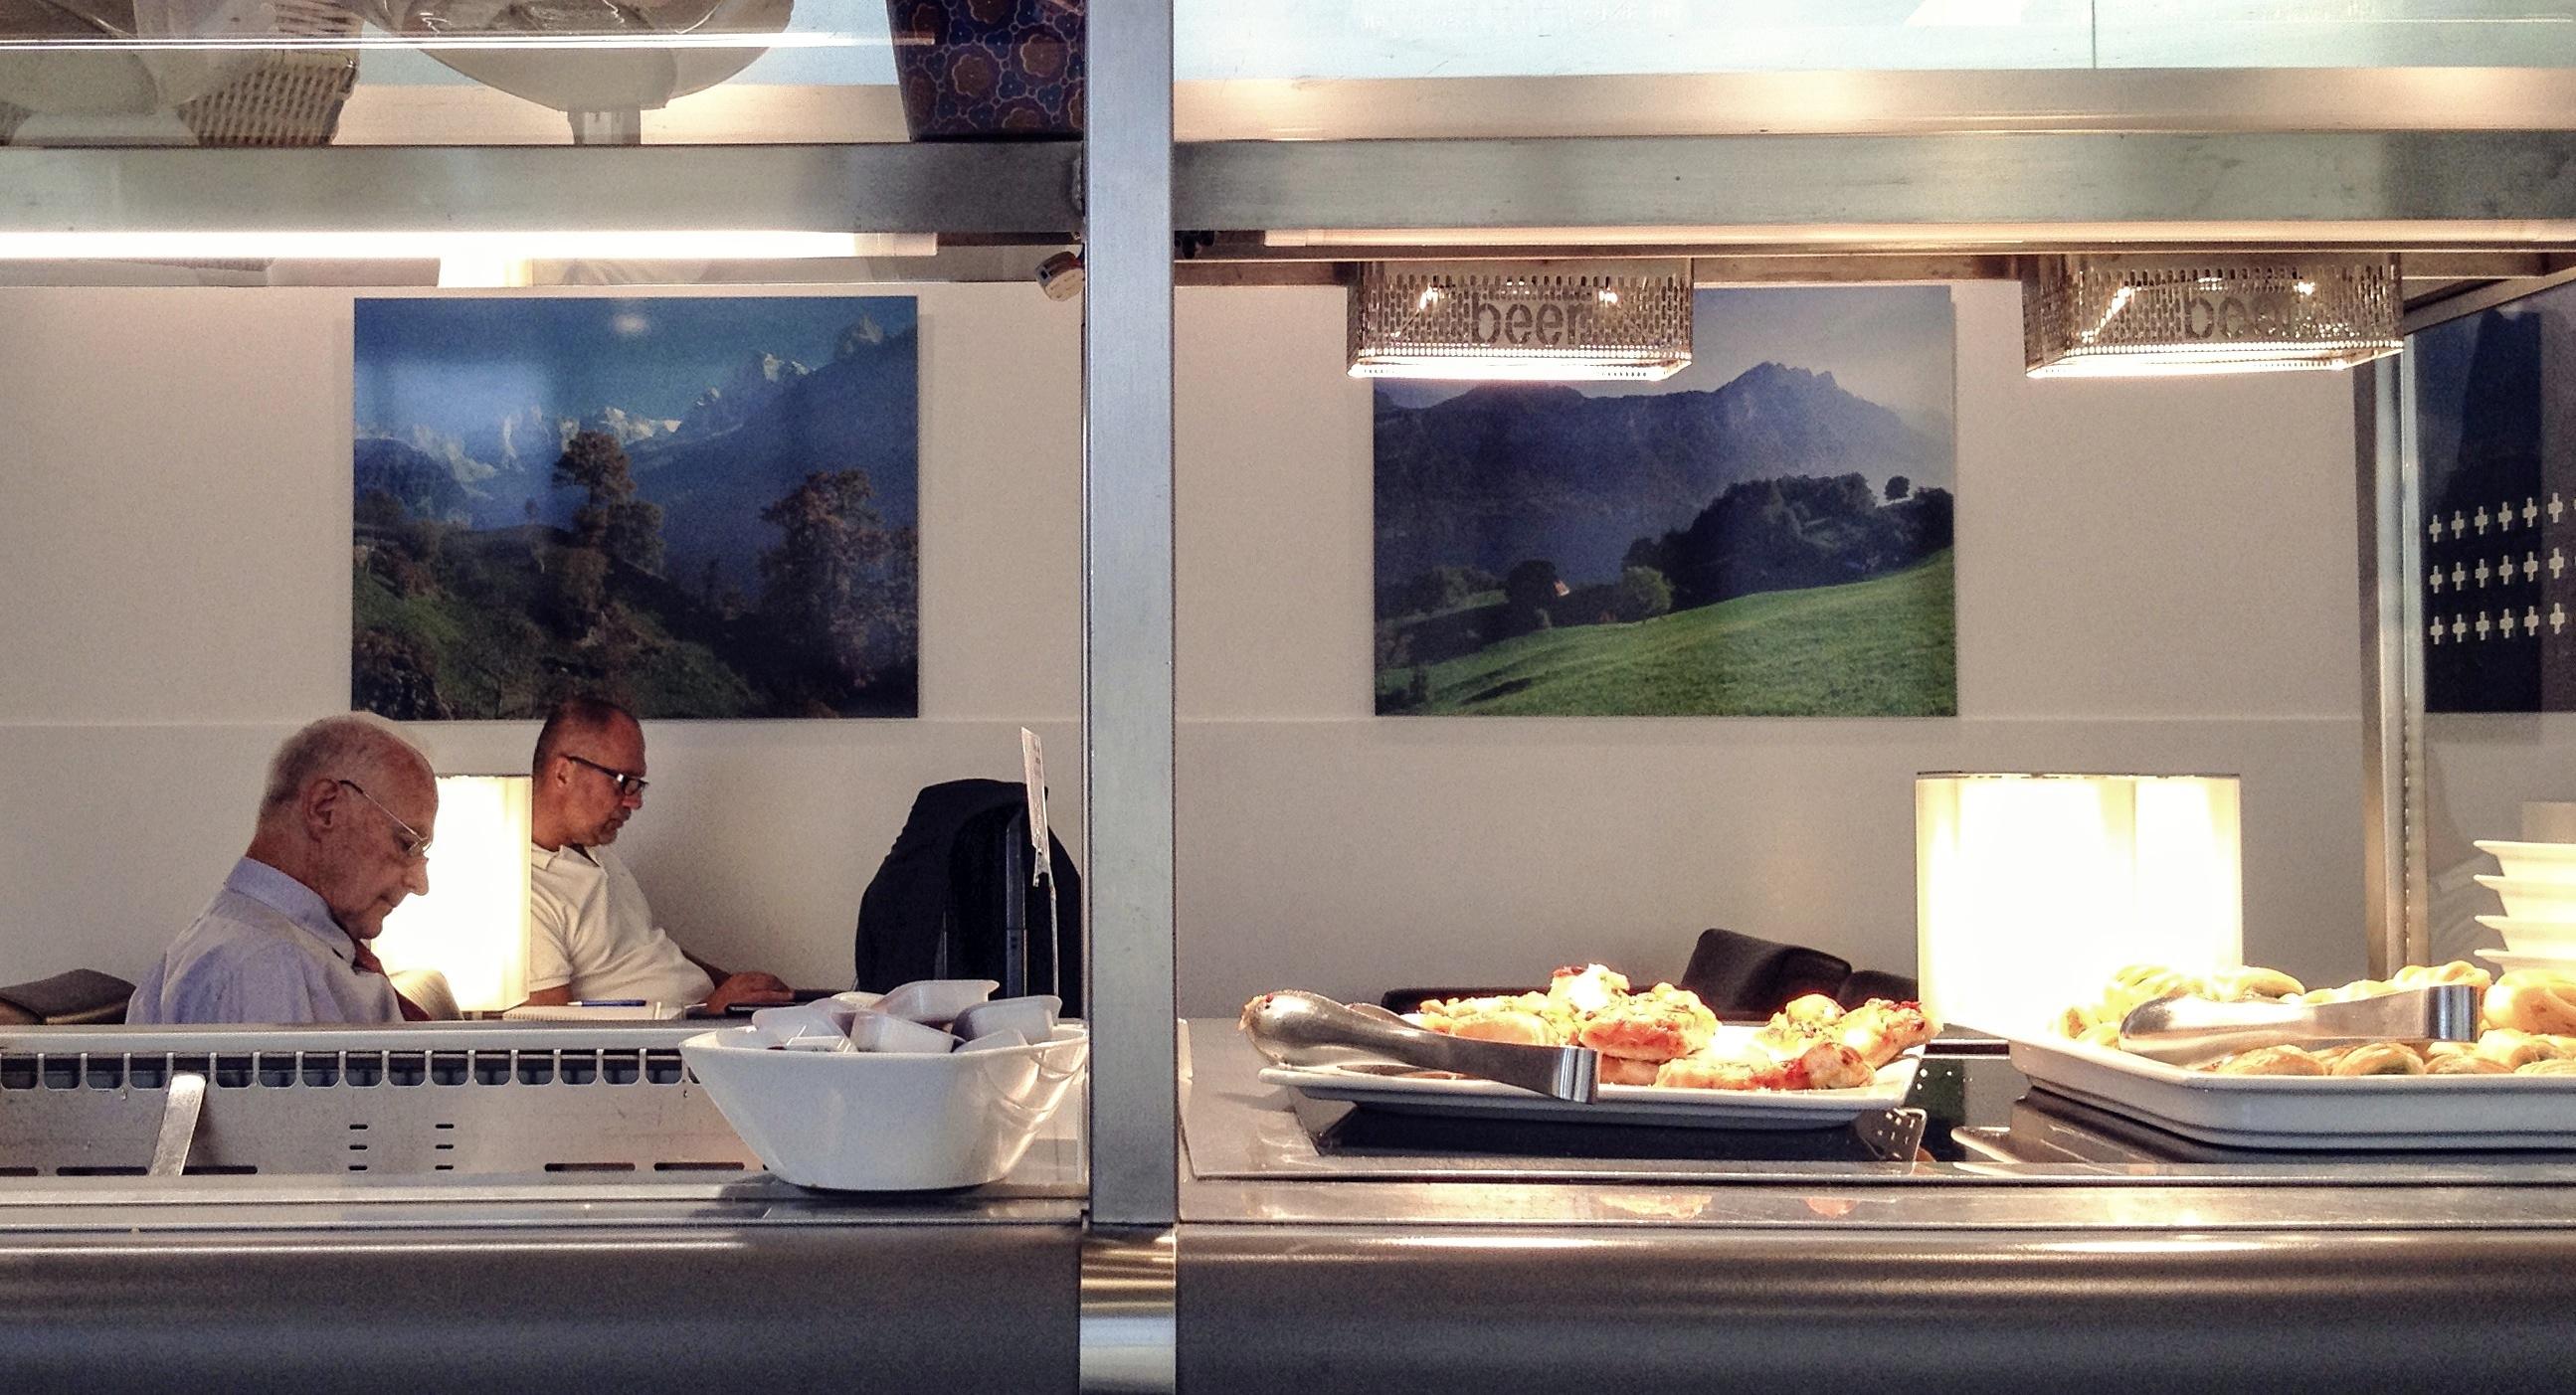 Viajeros en la sala VIP del aeropuerto de Ginebra en Suiza, Swiss Airlines